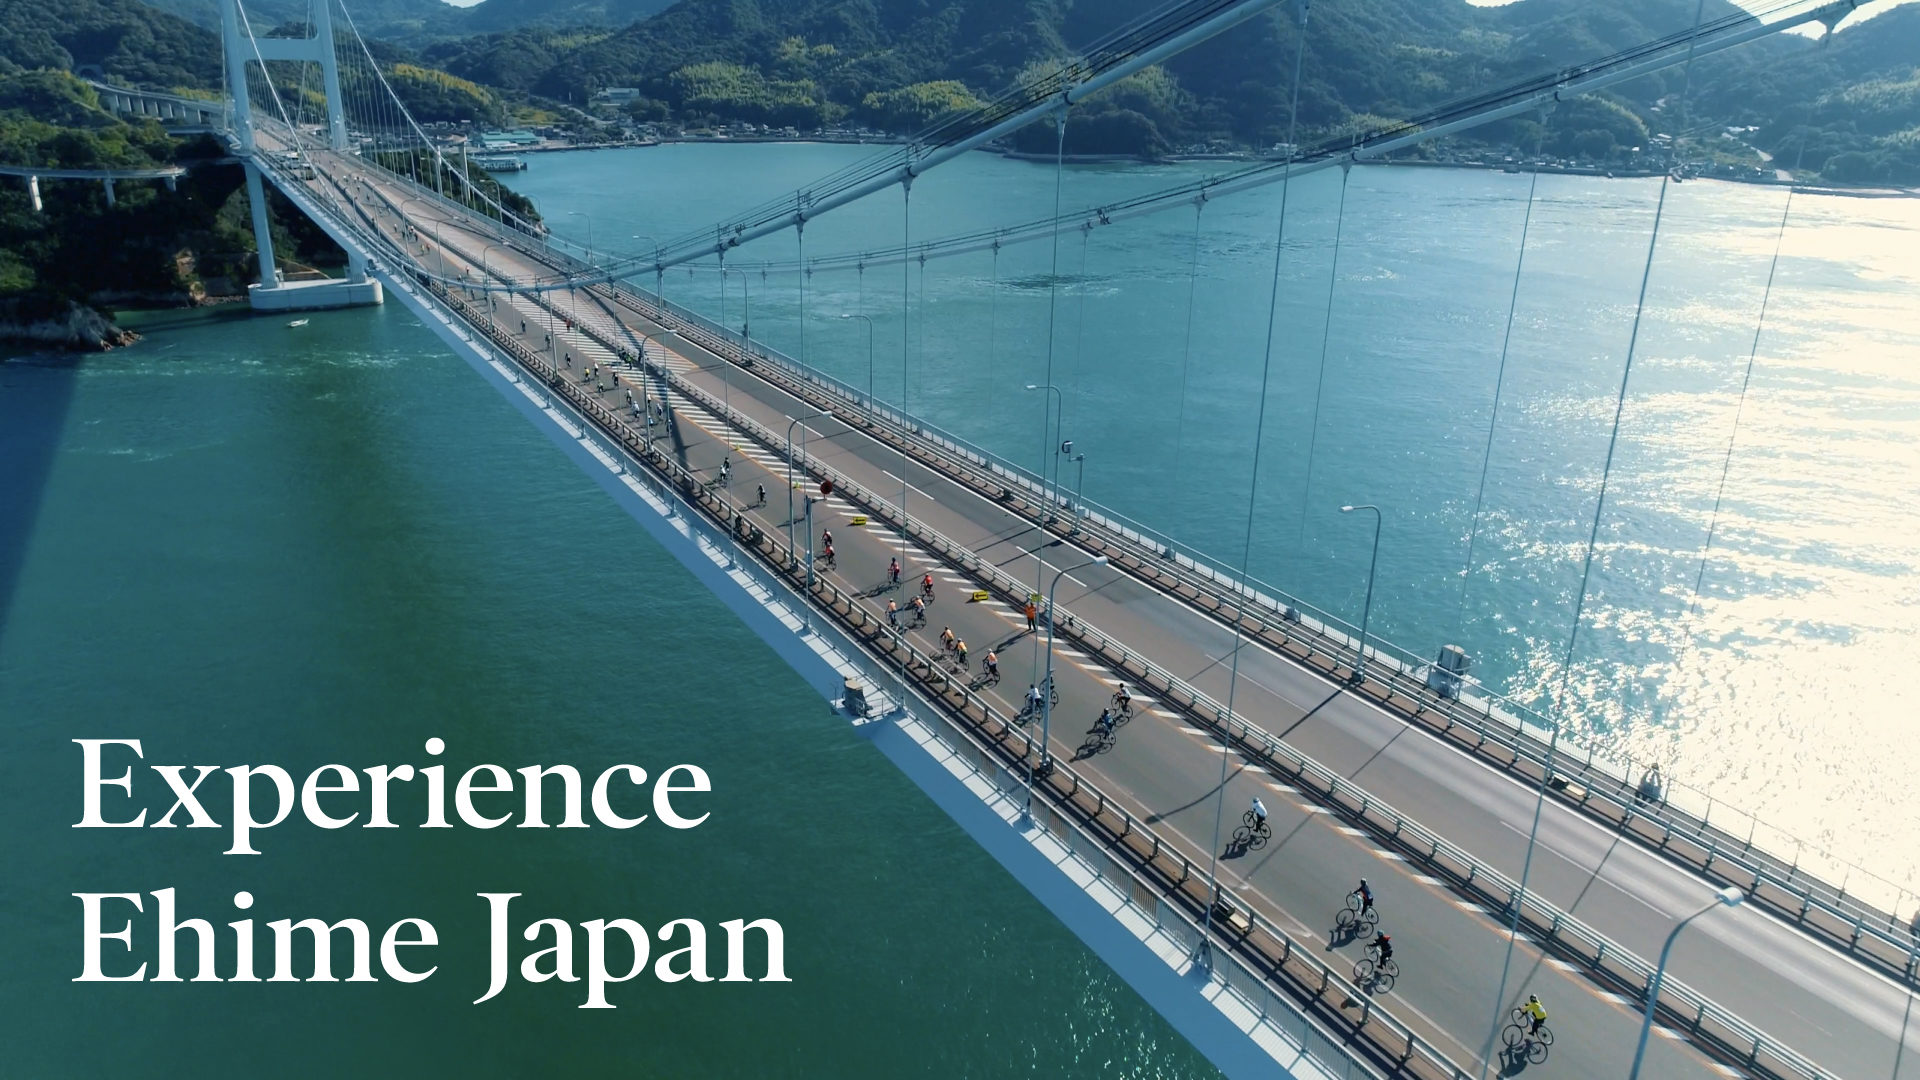 Experience Ehime Japan